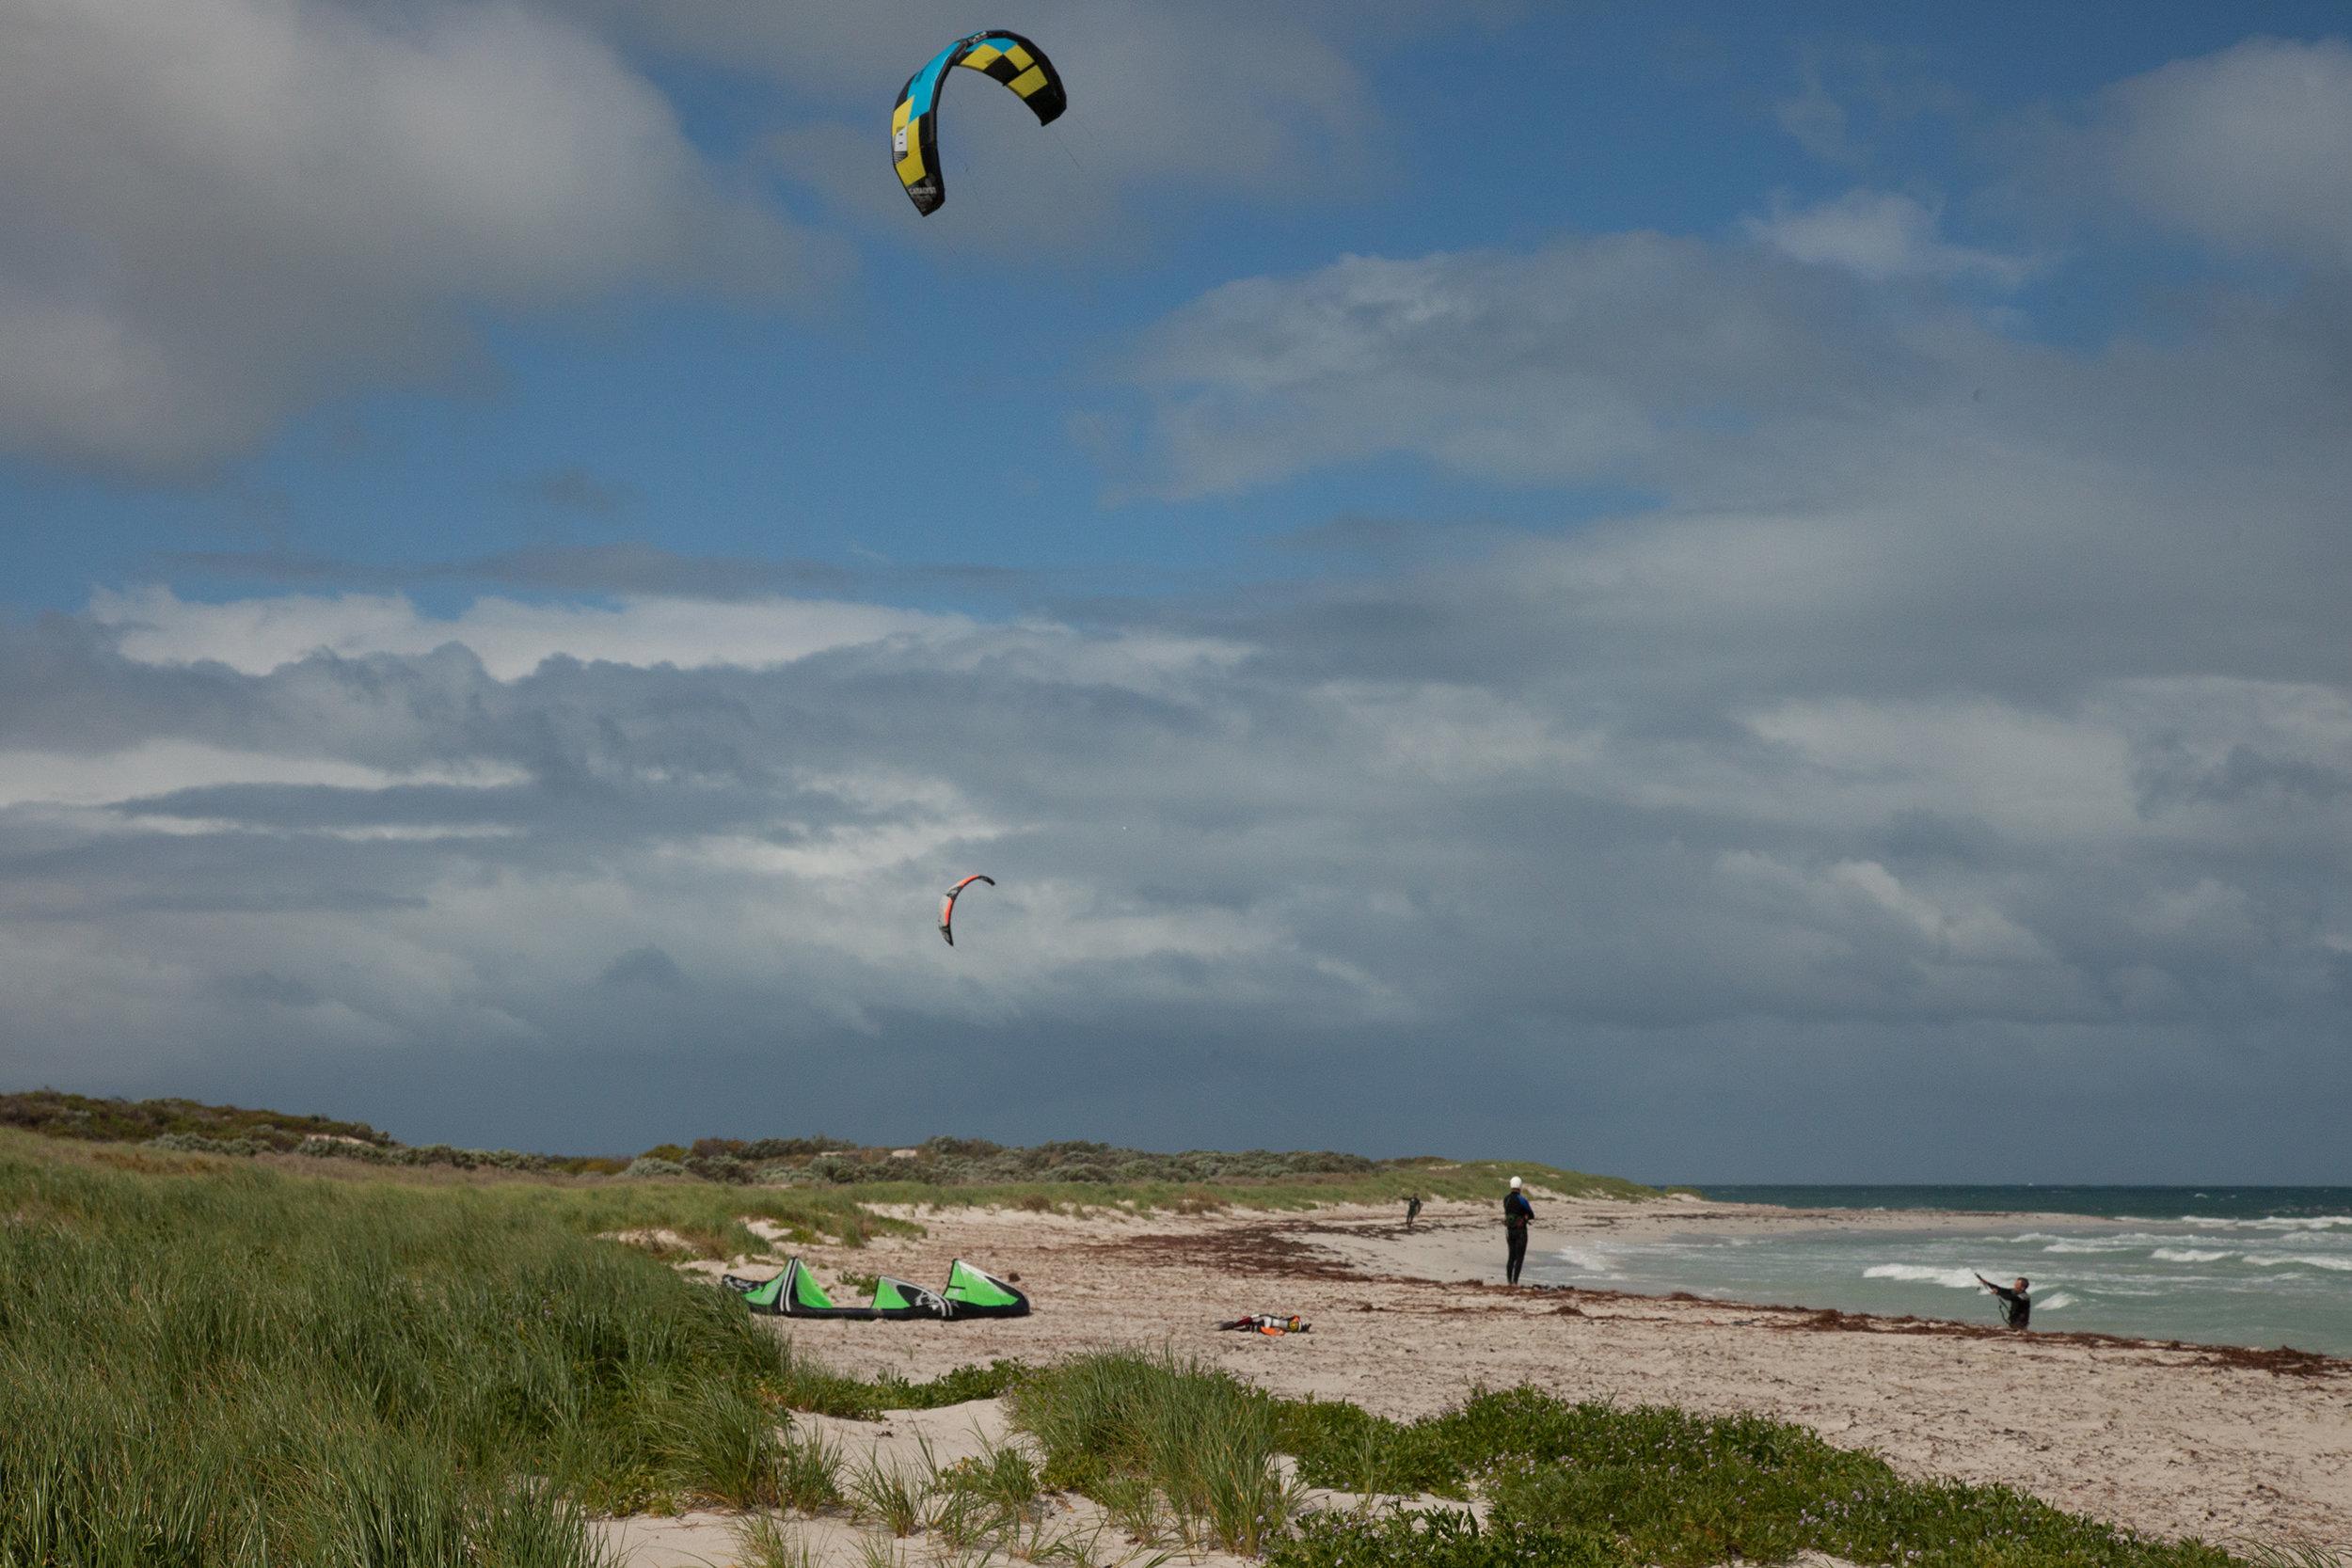 Two Rocks Kite surfing-1.jpg